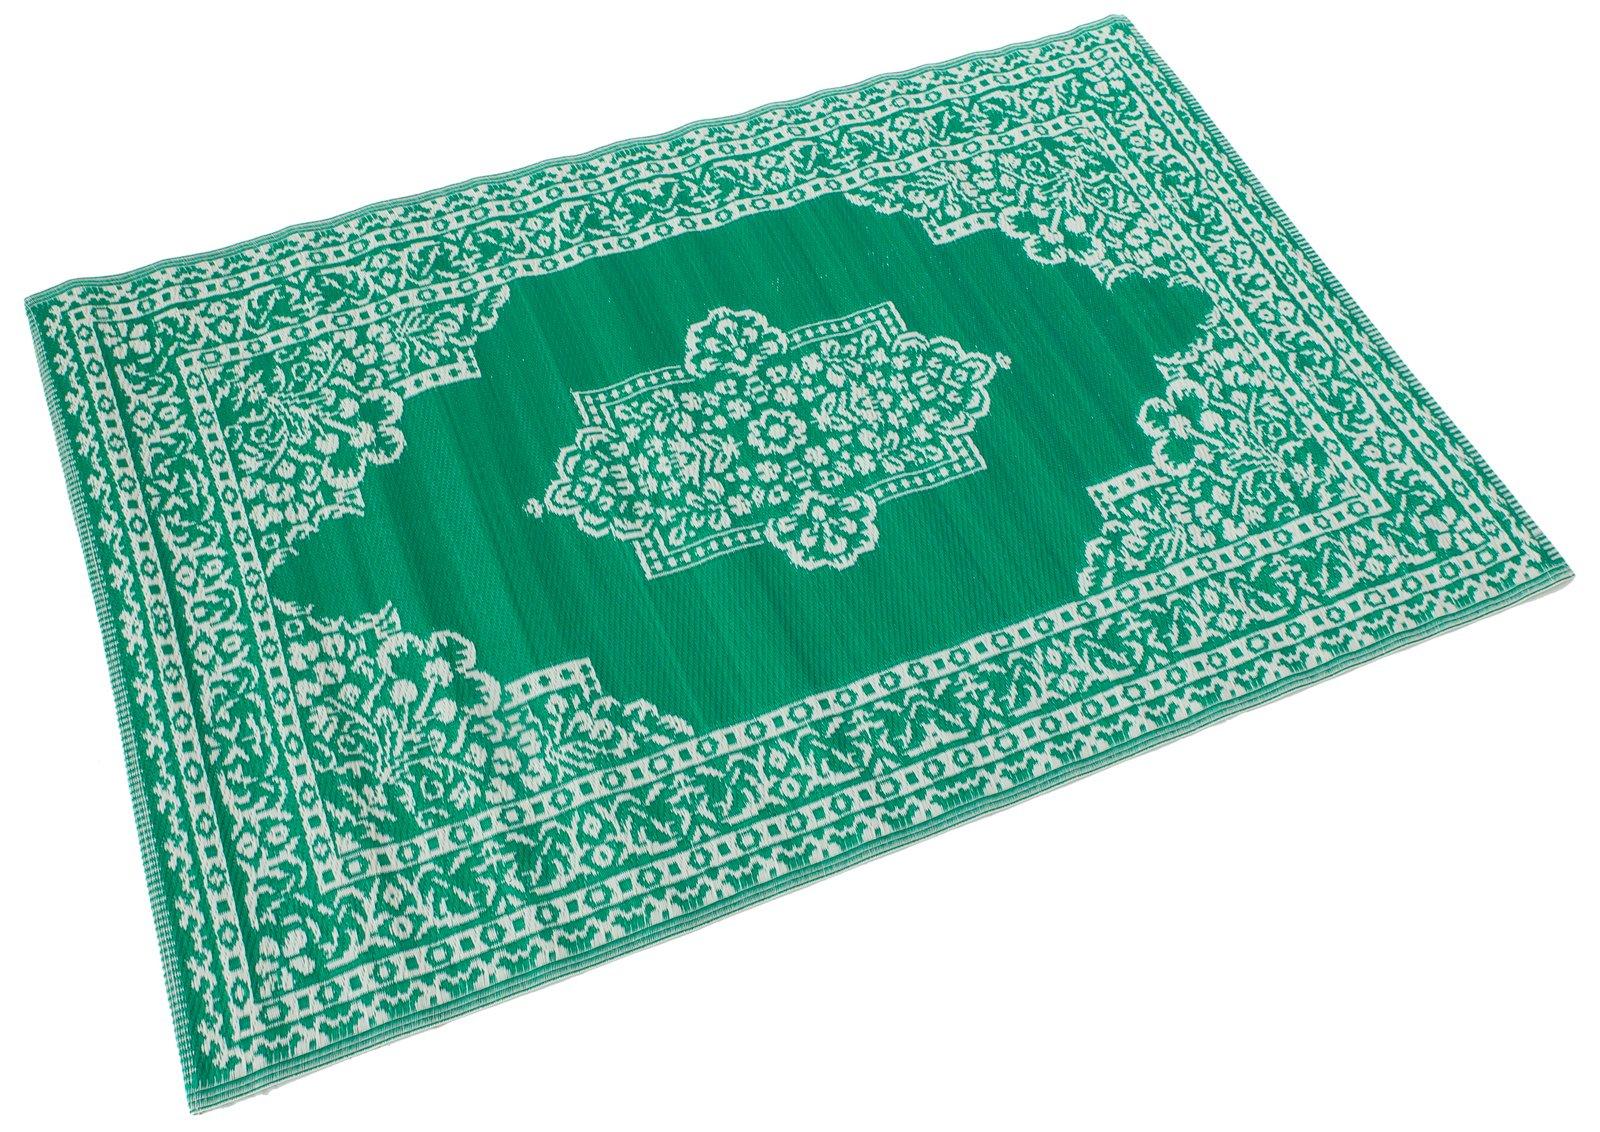 Tappeti colorati moderni tappeti design with tappeti - Tappeti colorati ...